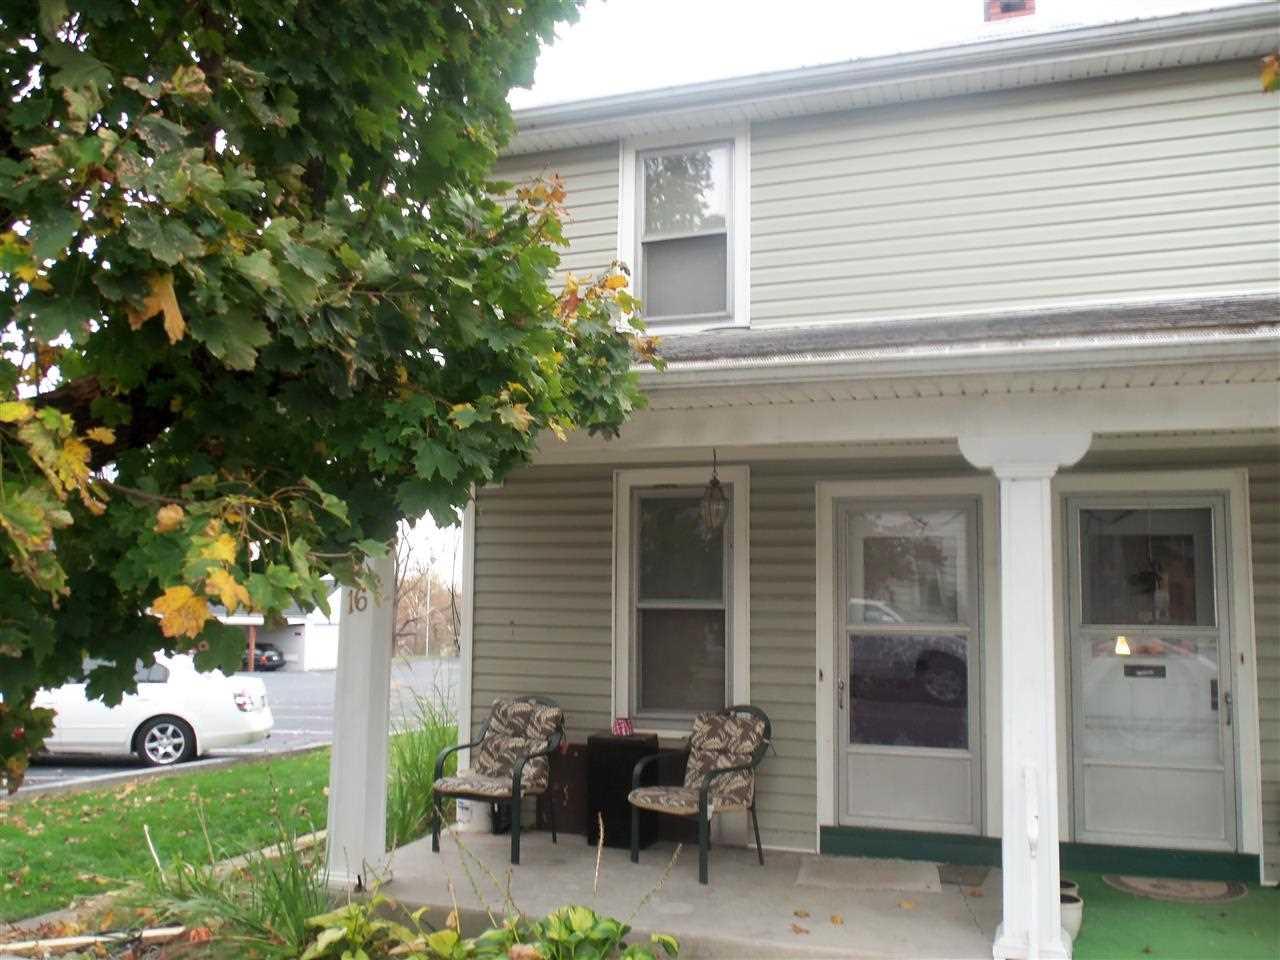 Rental Homes for Rent, ListingId:30569070, location: 16 W Main Street Hershey 17033